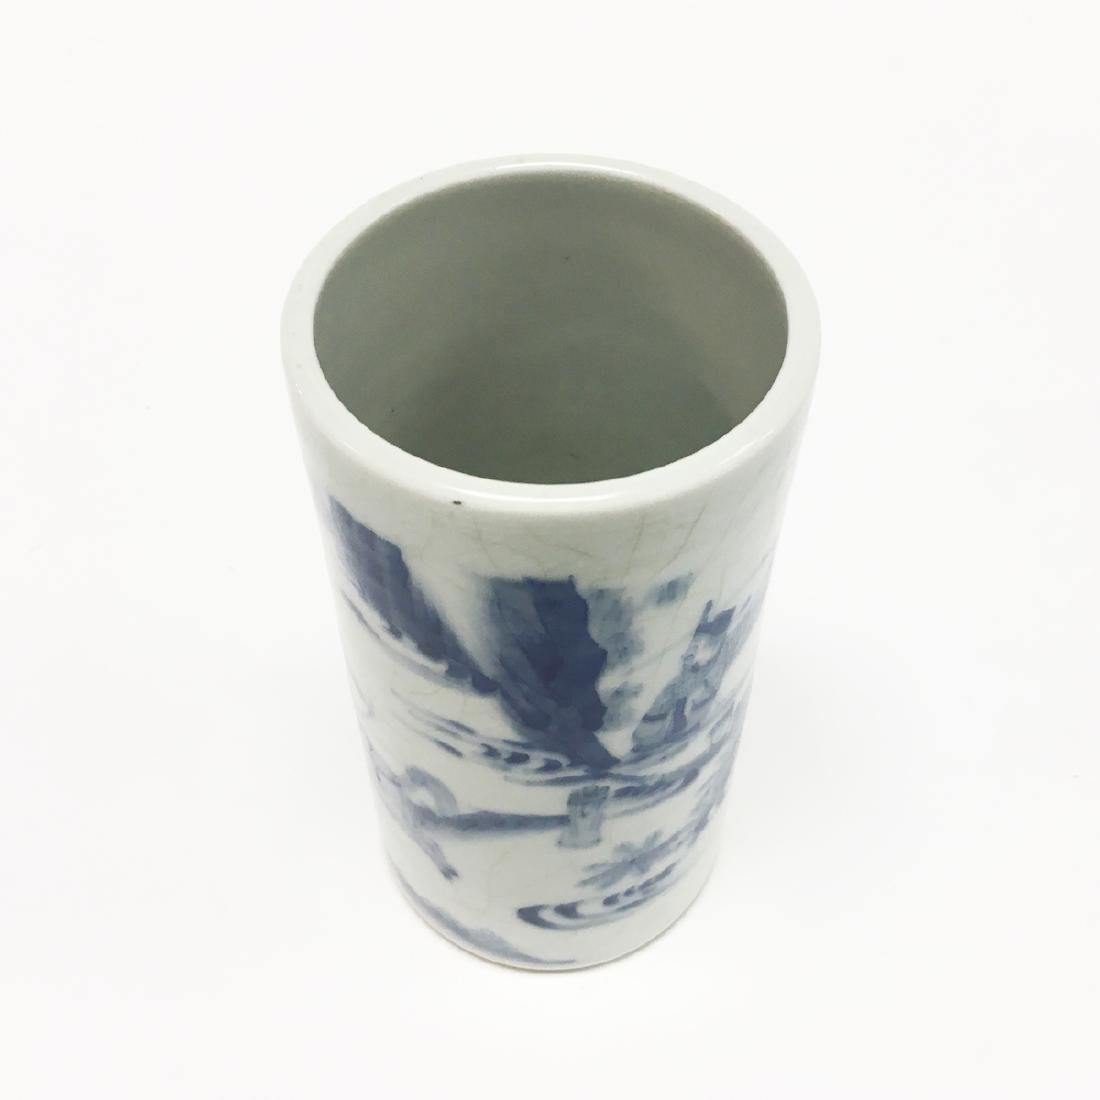 Chinese Porcelain Blue and White Brush Pot - 3